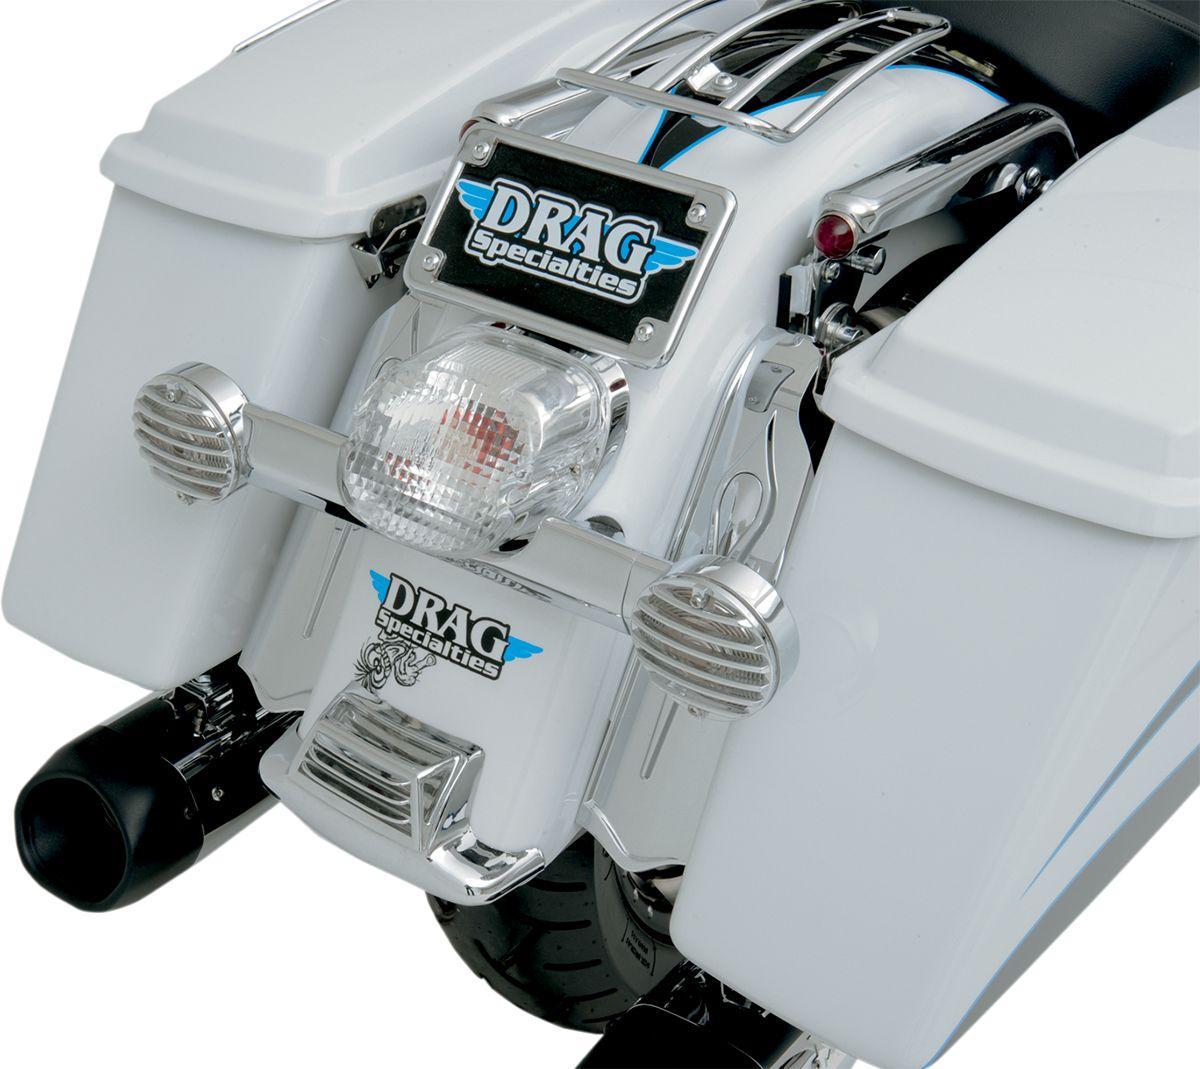 【Drag Specialties】10方向燈支架/91-17 FL'S用 【10SIGNAL BRKT 91-17 FL'S [DS-280271]】 - 「Webike-摩托百貨」